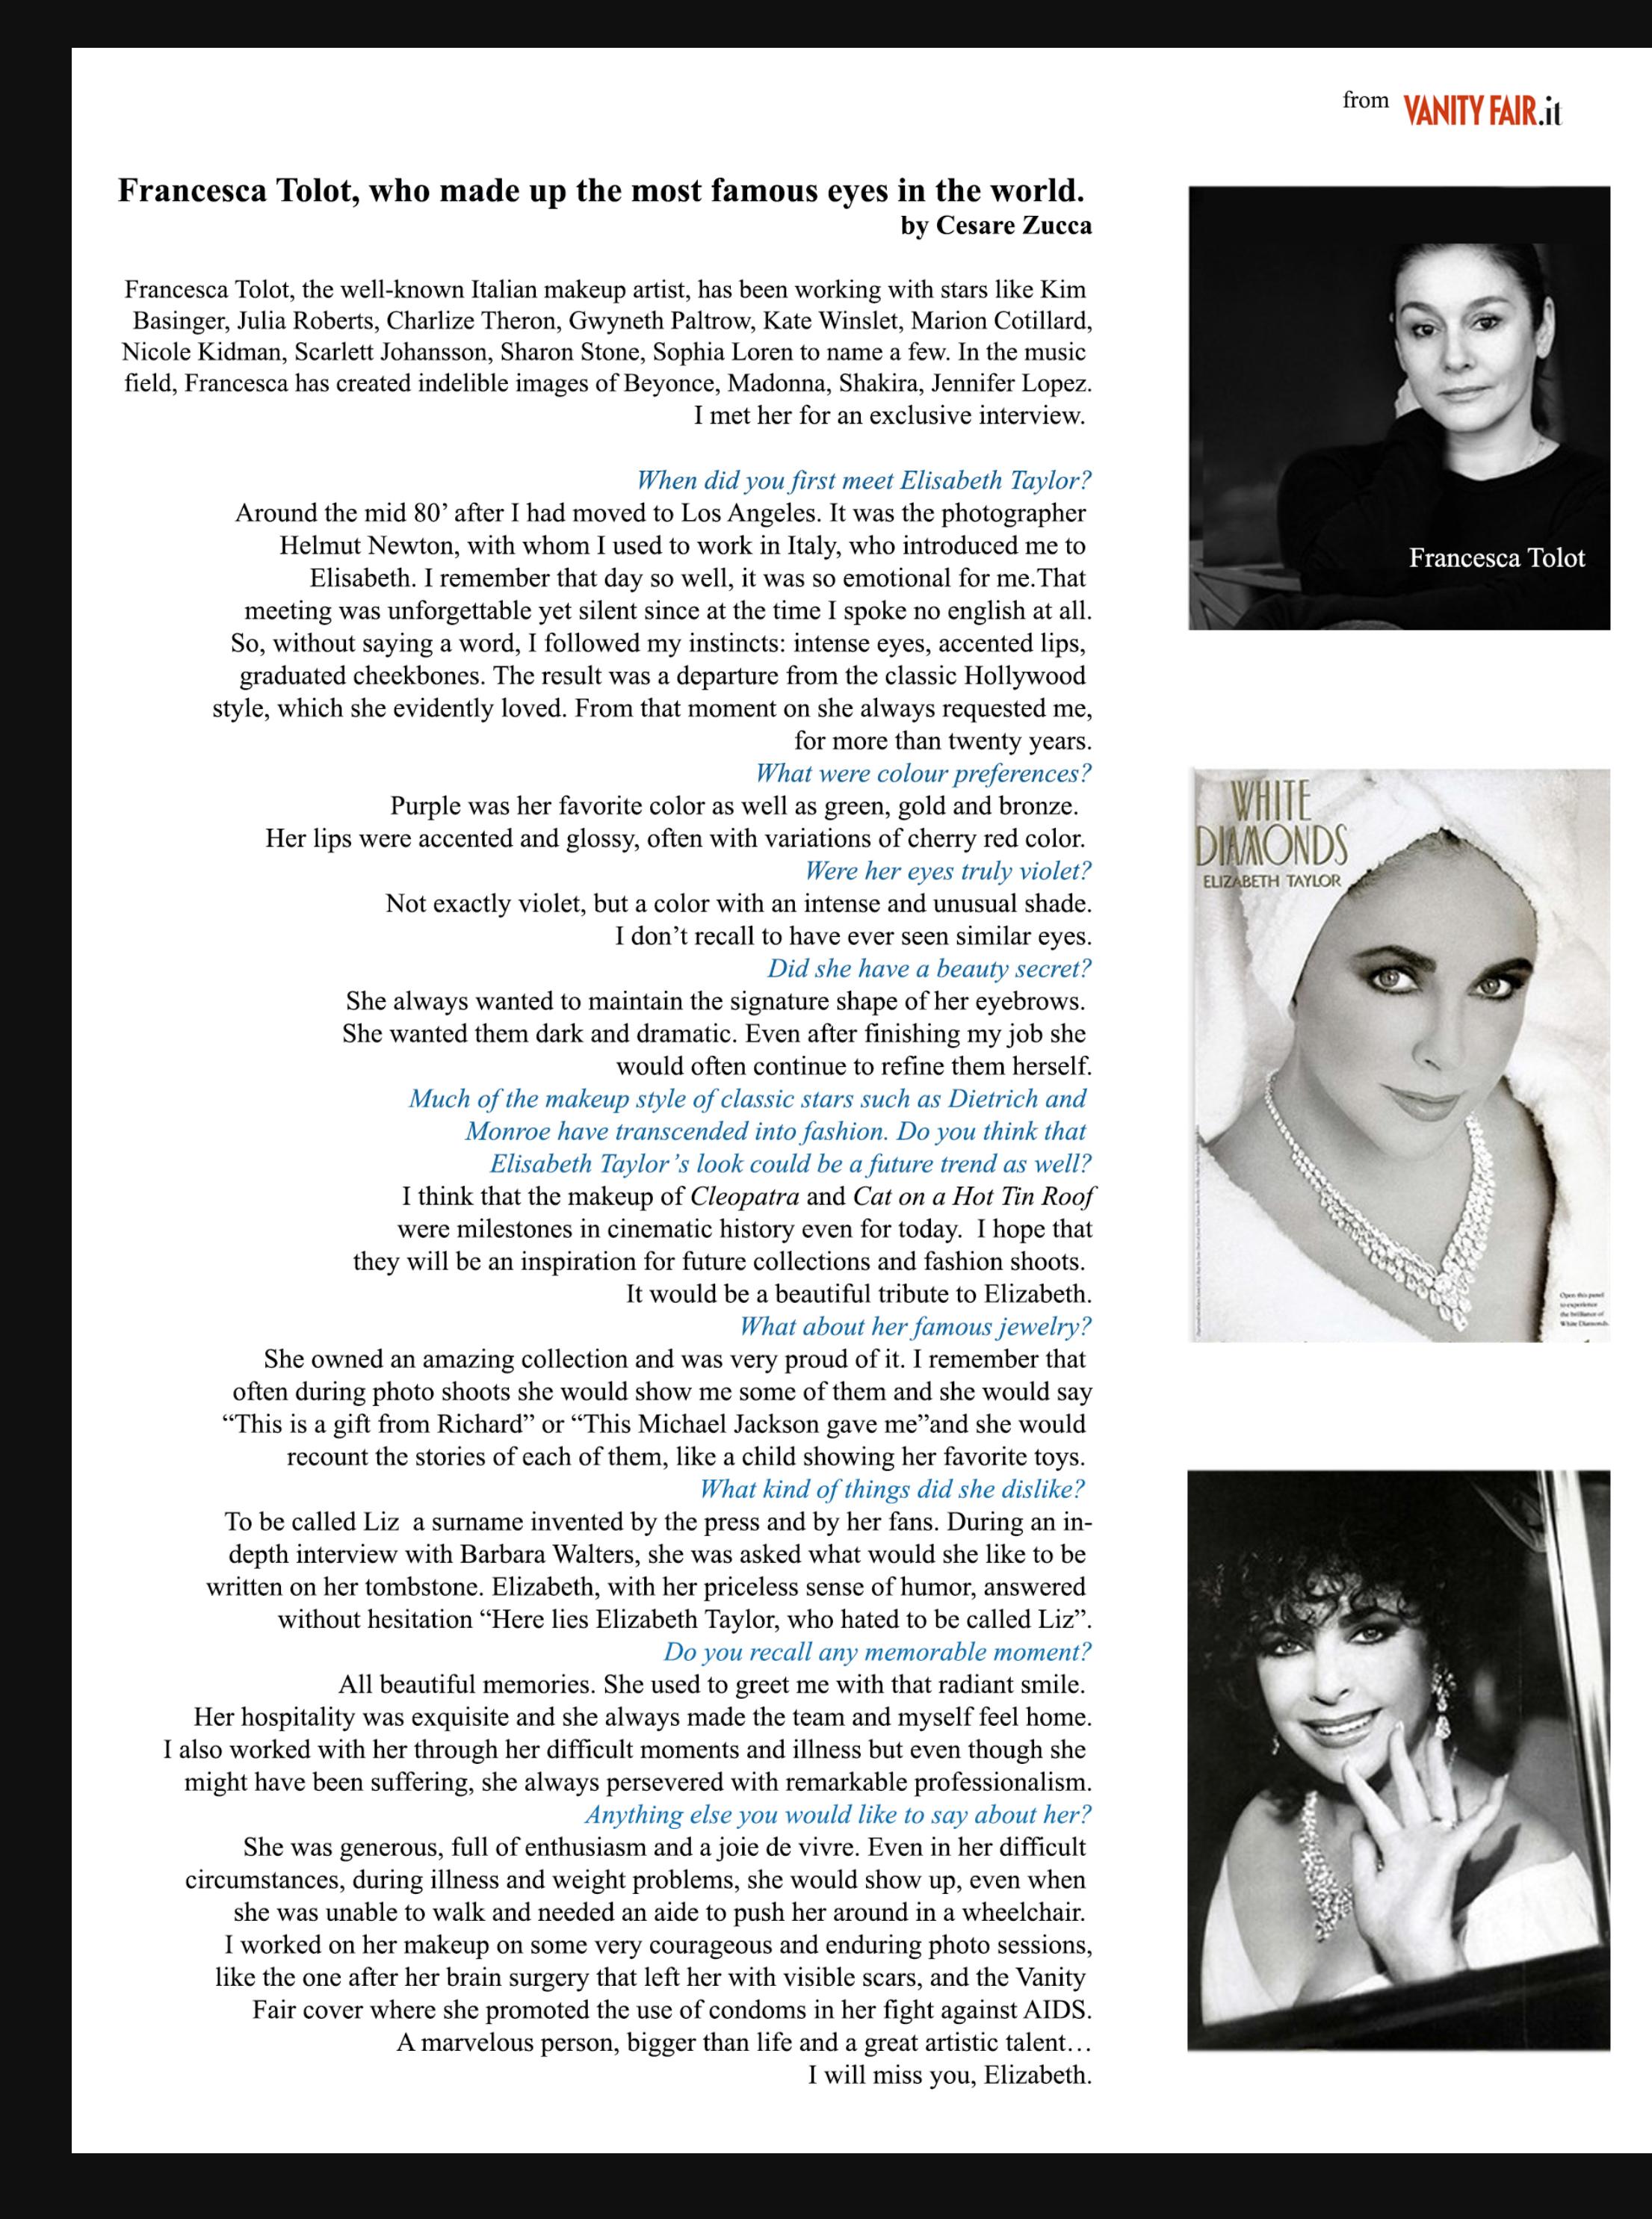 Francesca Tolot Interview Vanity Fair.it .jpg